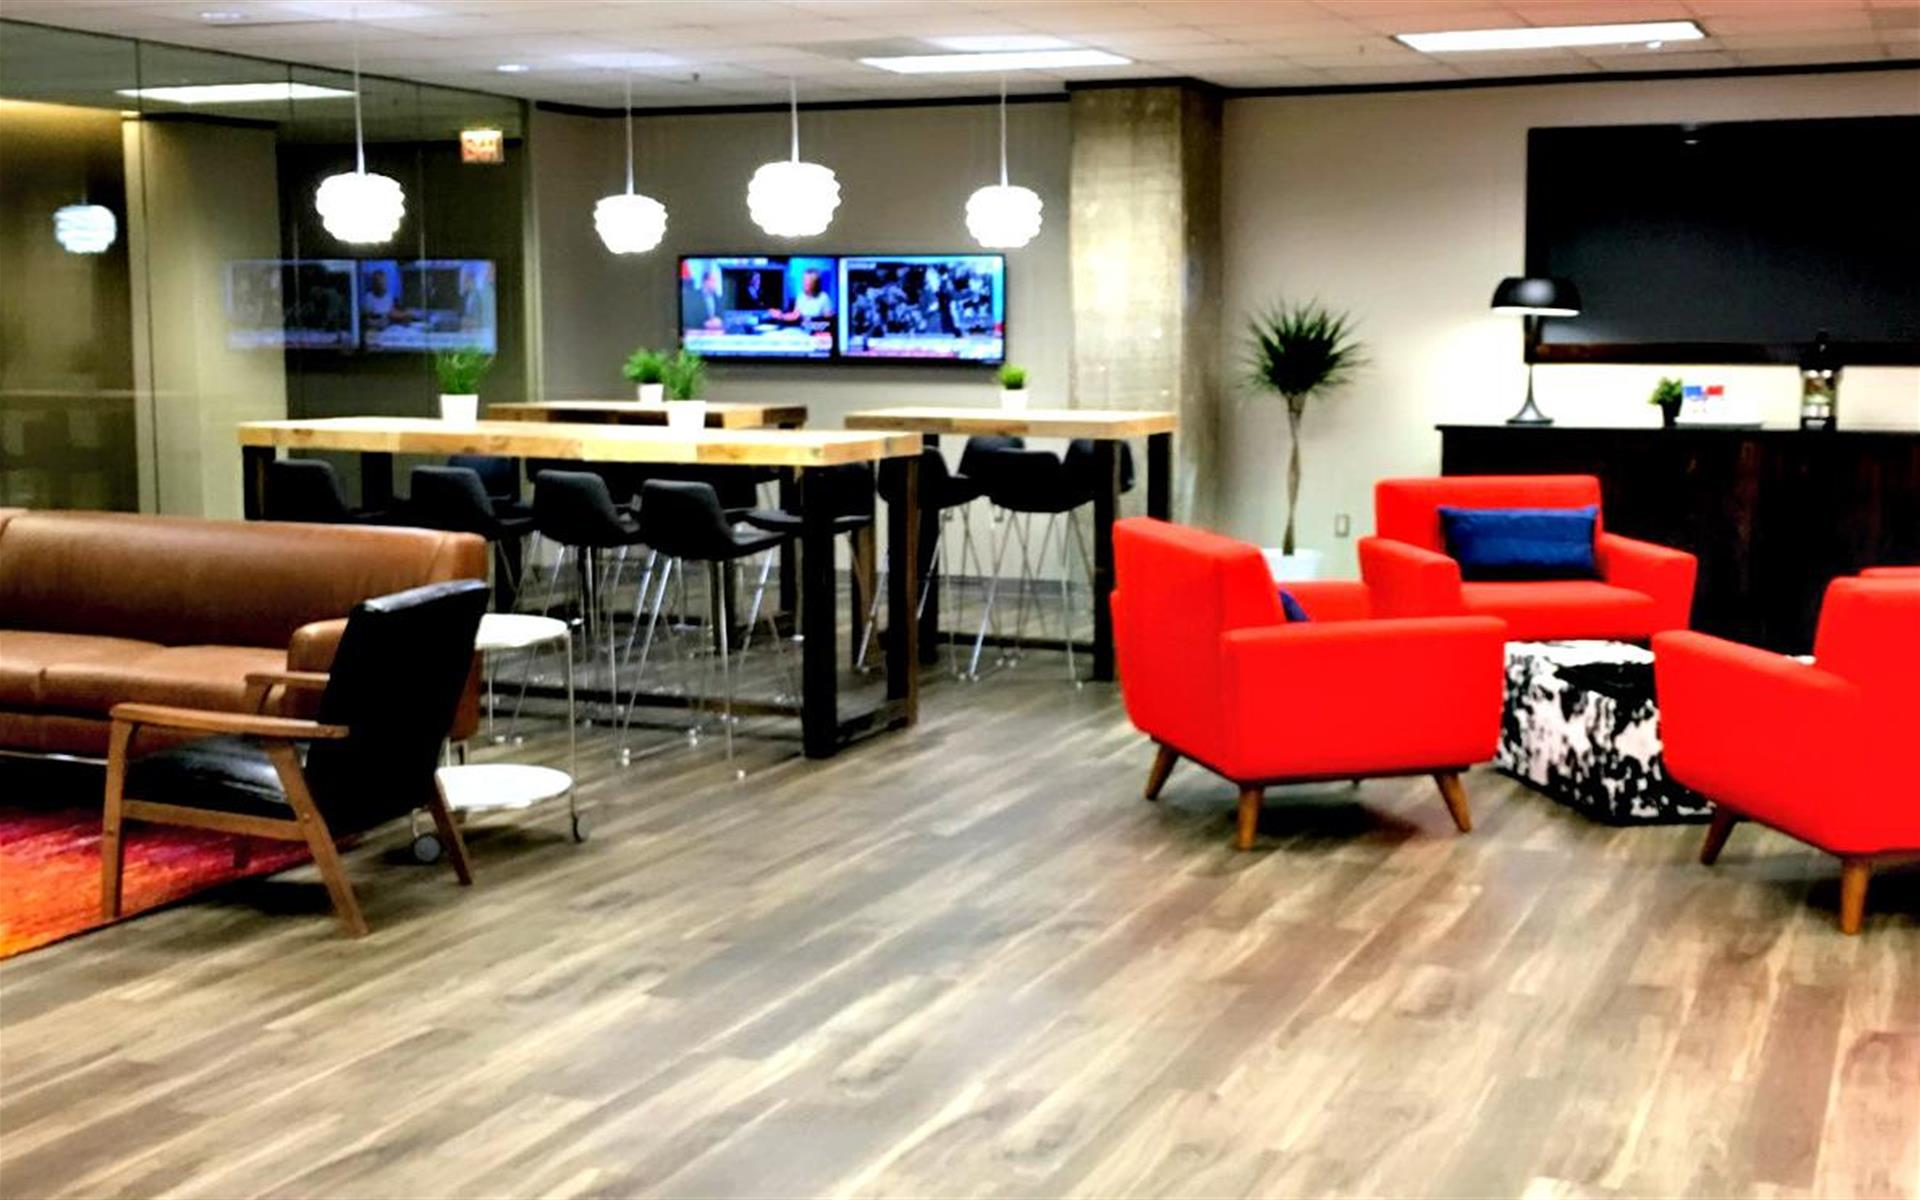 CUBExec - Interchange Building Executive Suites - Lobby Work Space